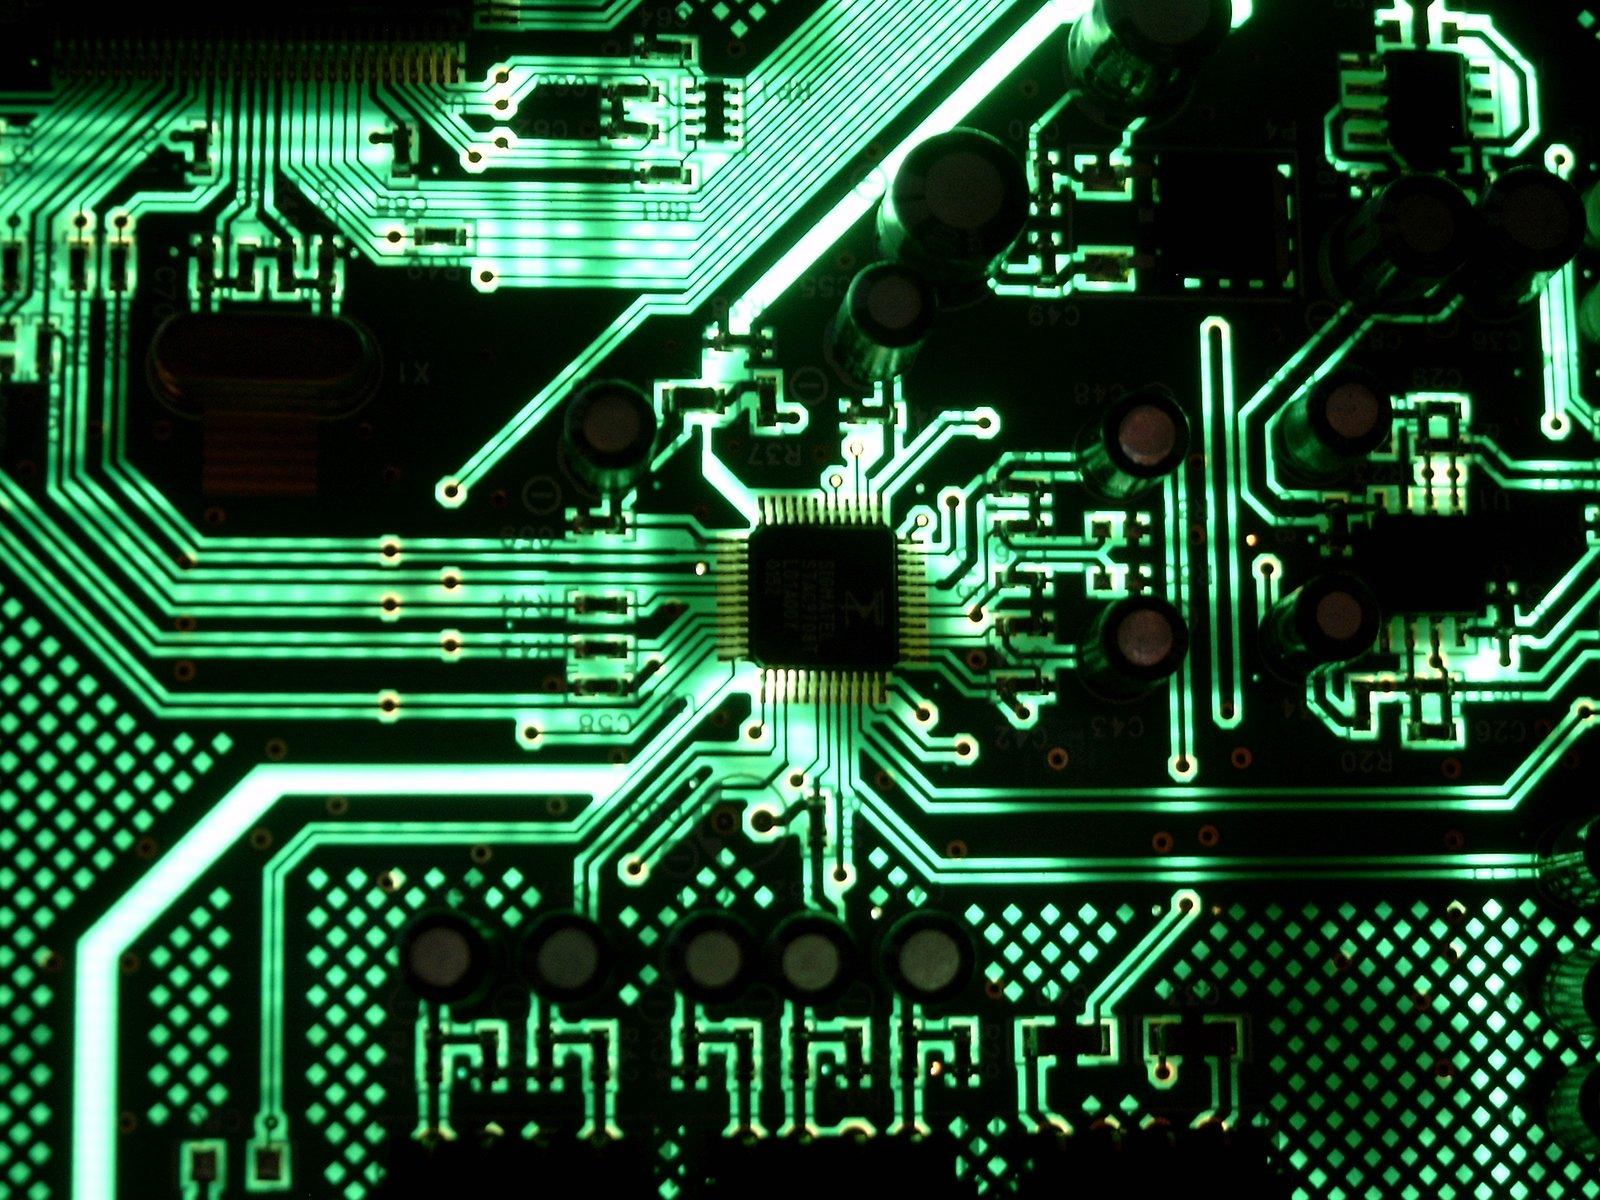 electronics,computers,circuit,board